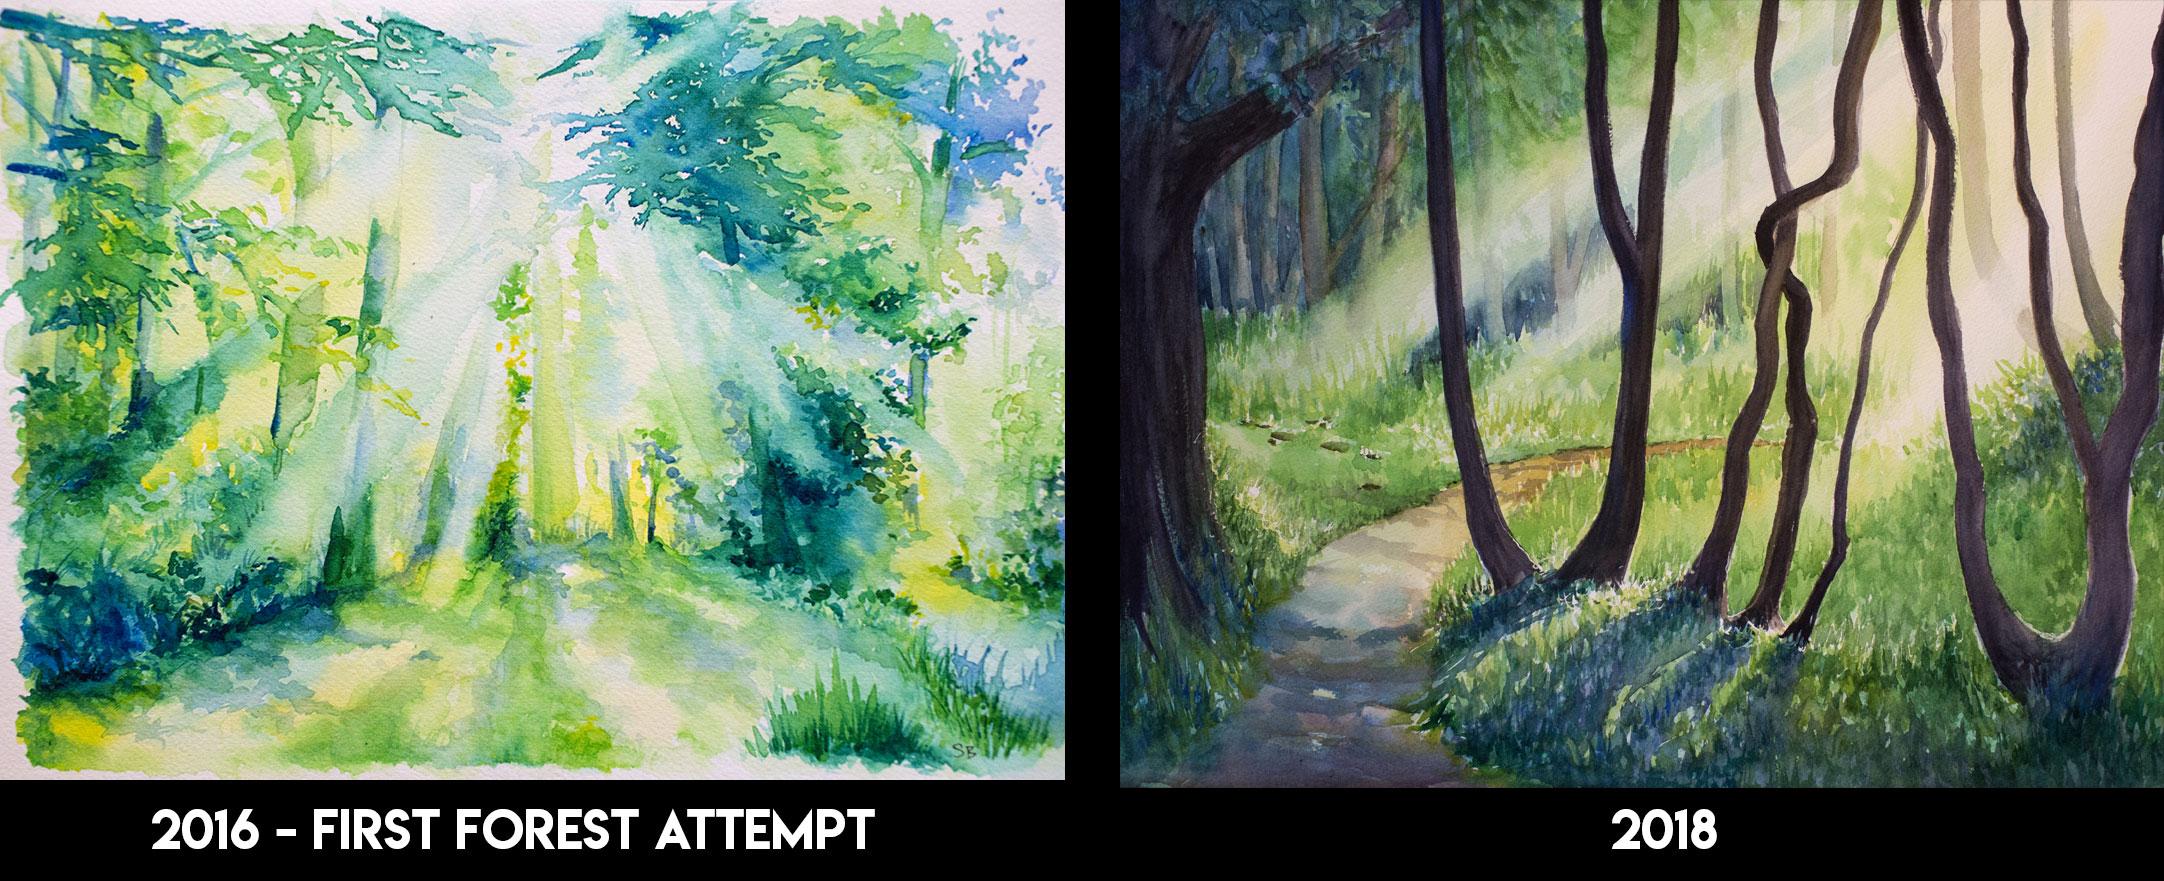 Forest-Comparison.jpg